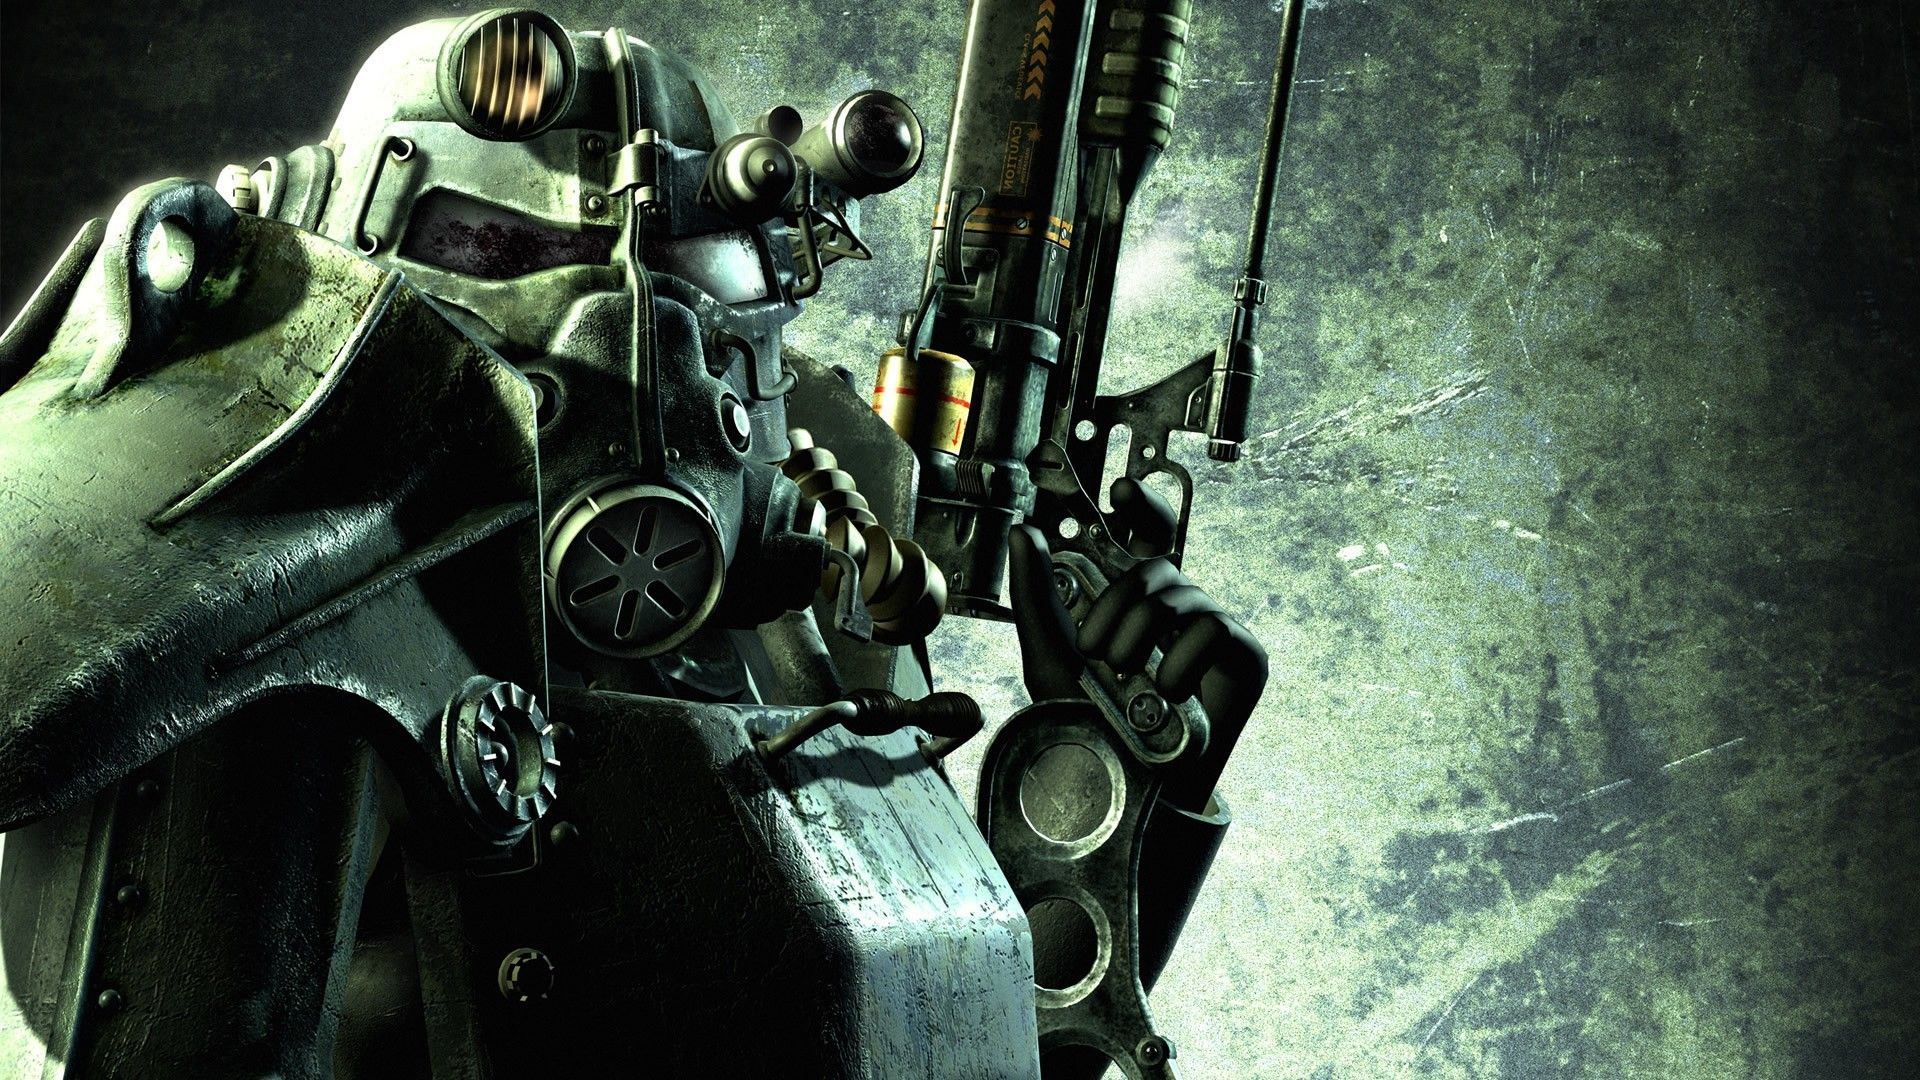 1920x1200 Fallout Background HD Widescreen Wallpaper